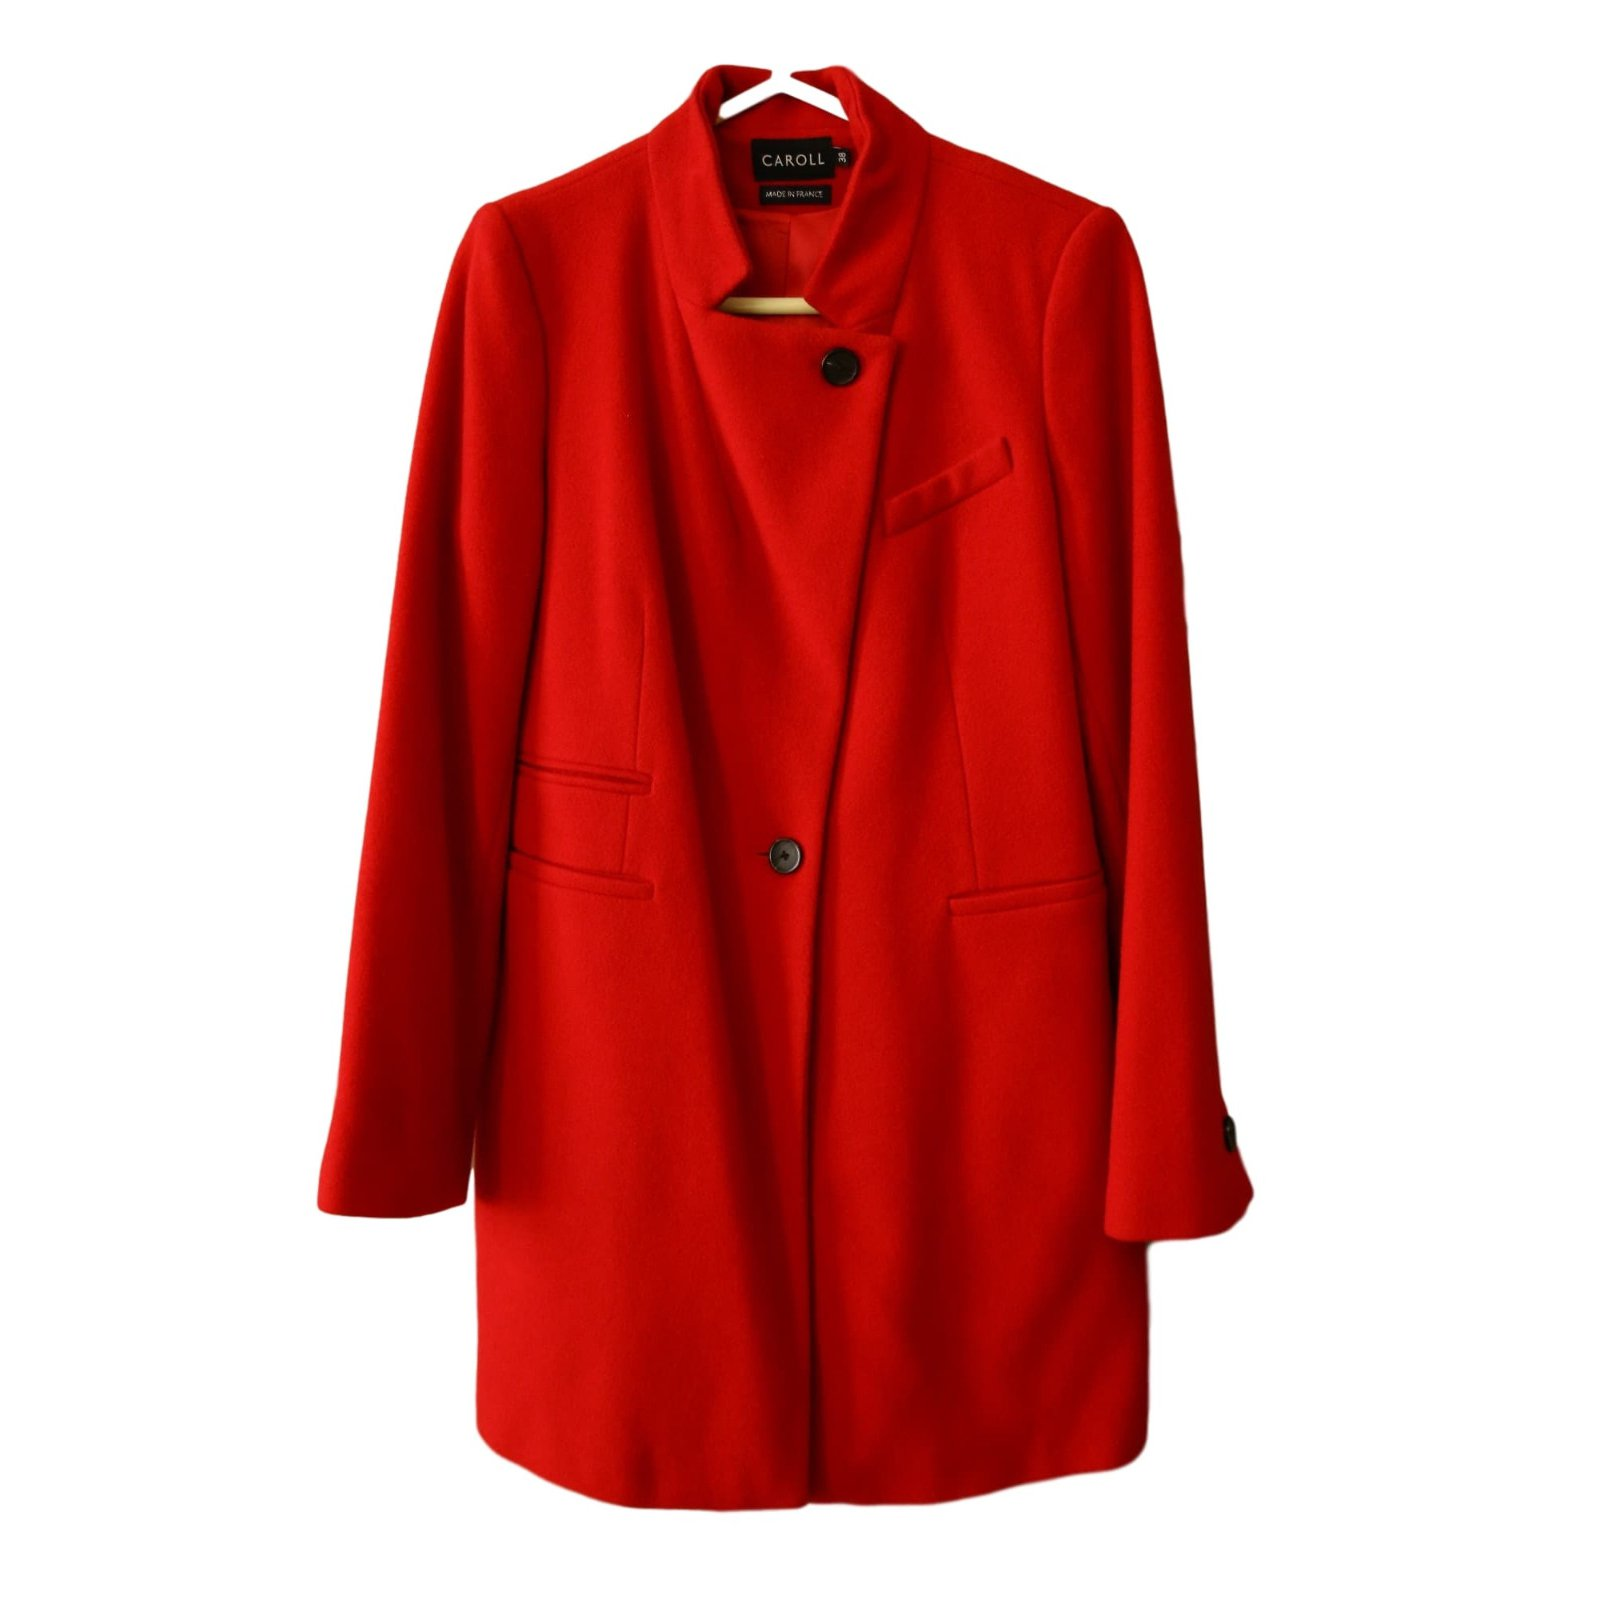 Caroll Ref Manteaux laine Manteau Cachemire polyamide Rouge 44719 wPXiuTOZk